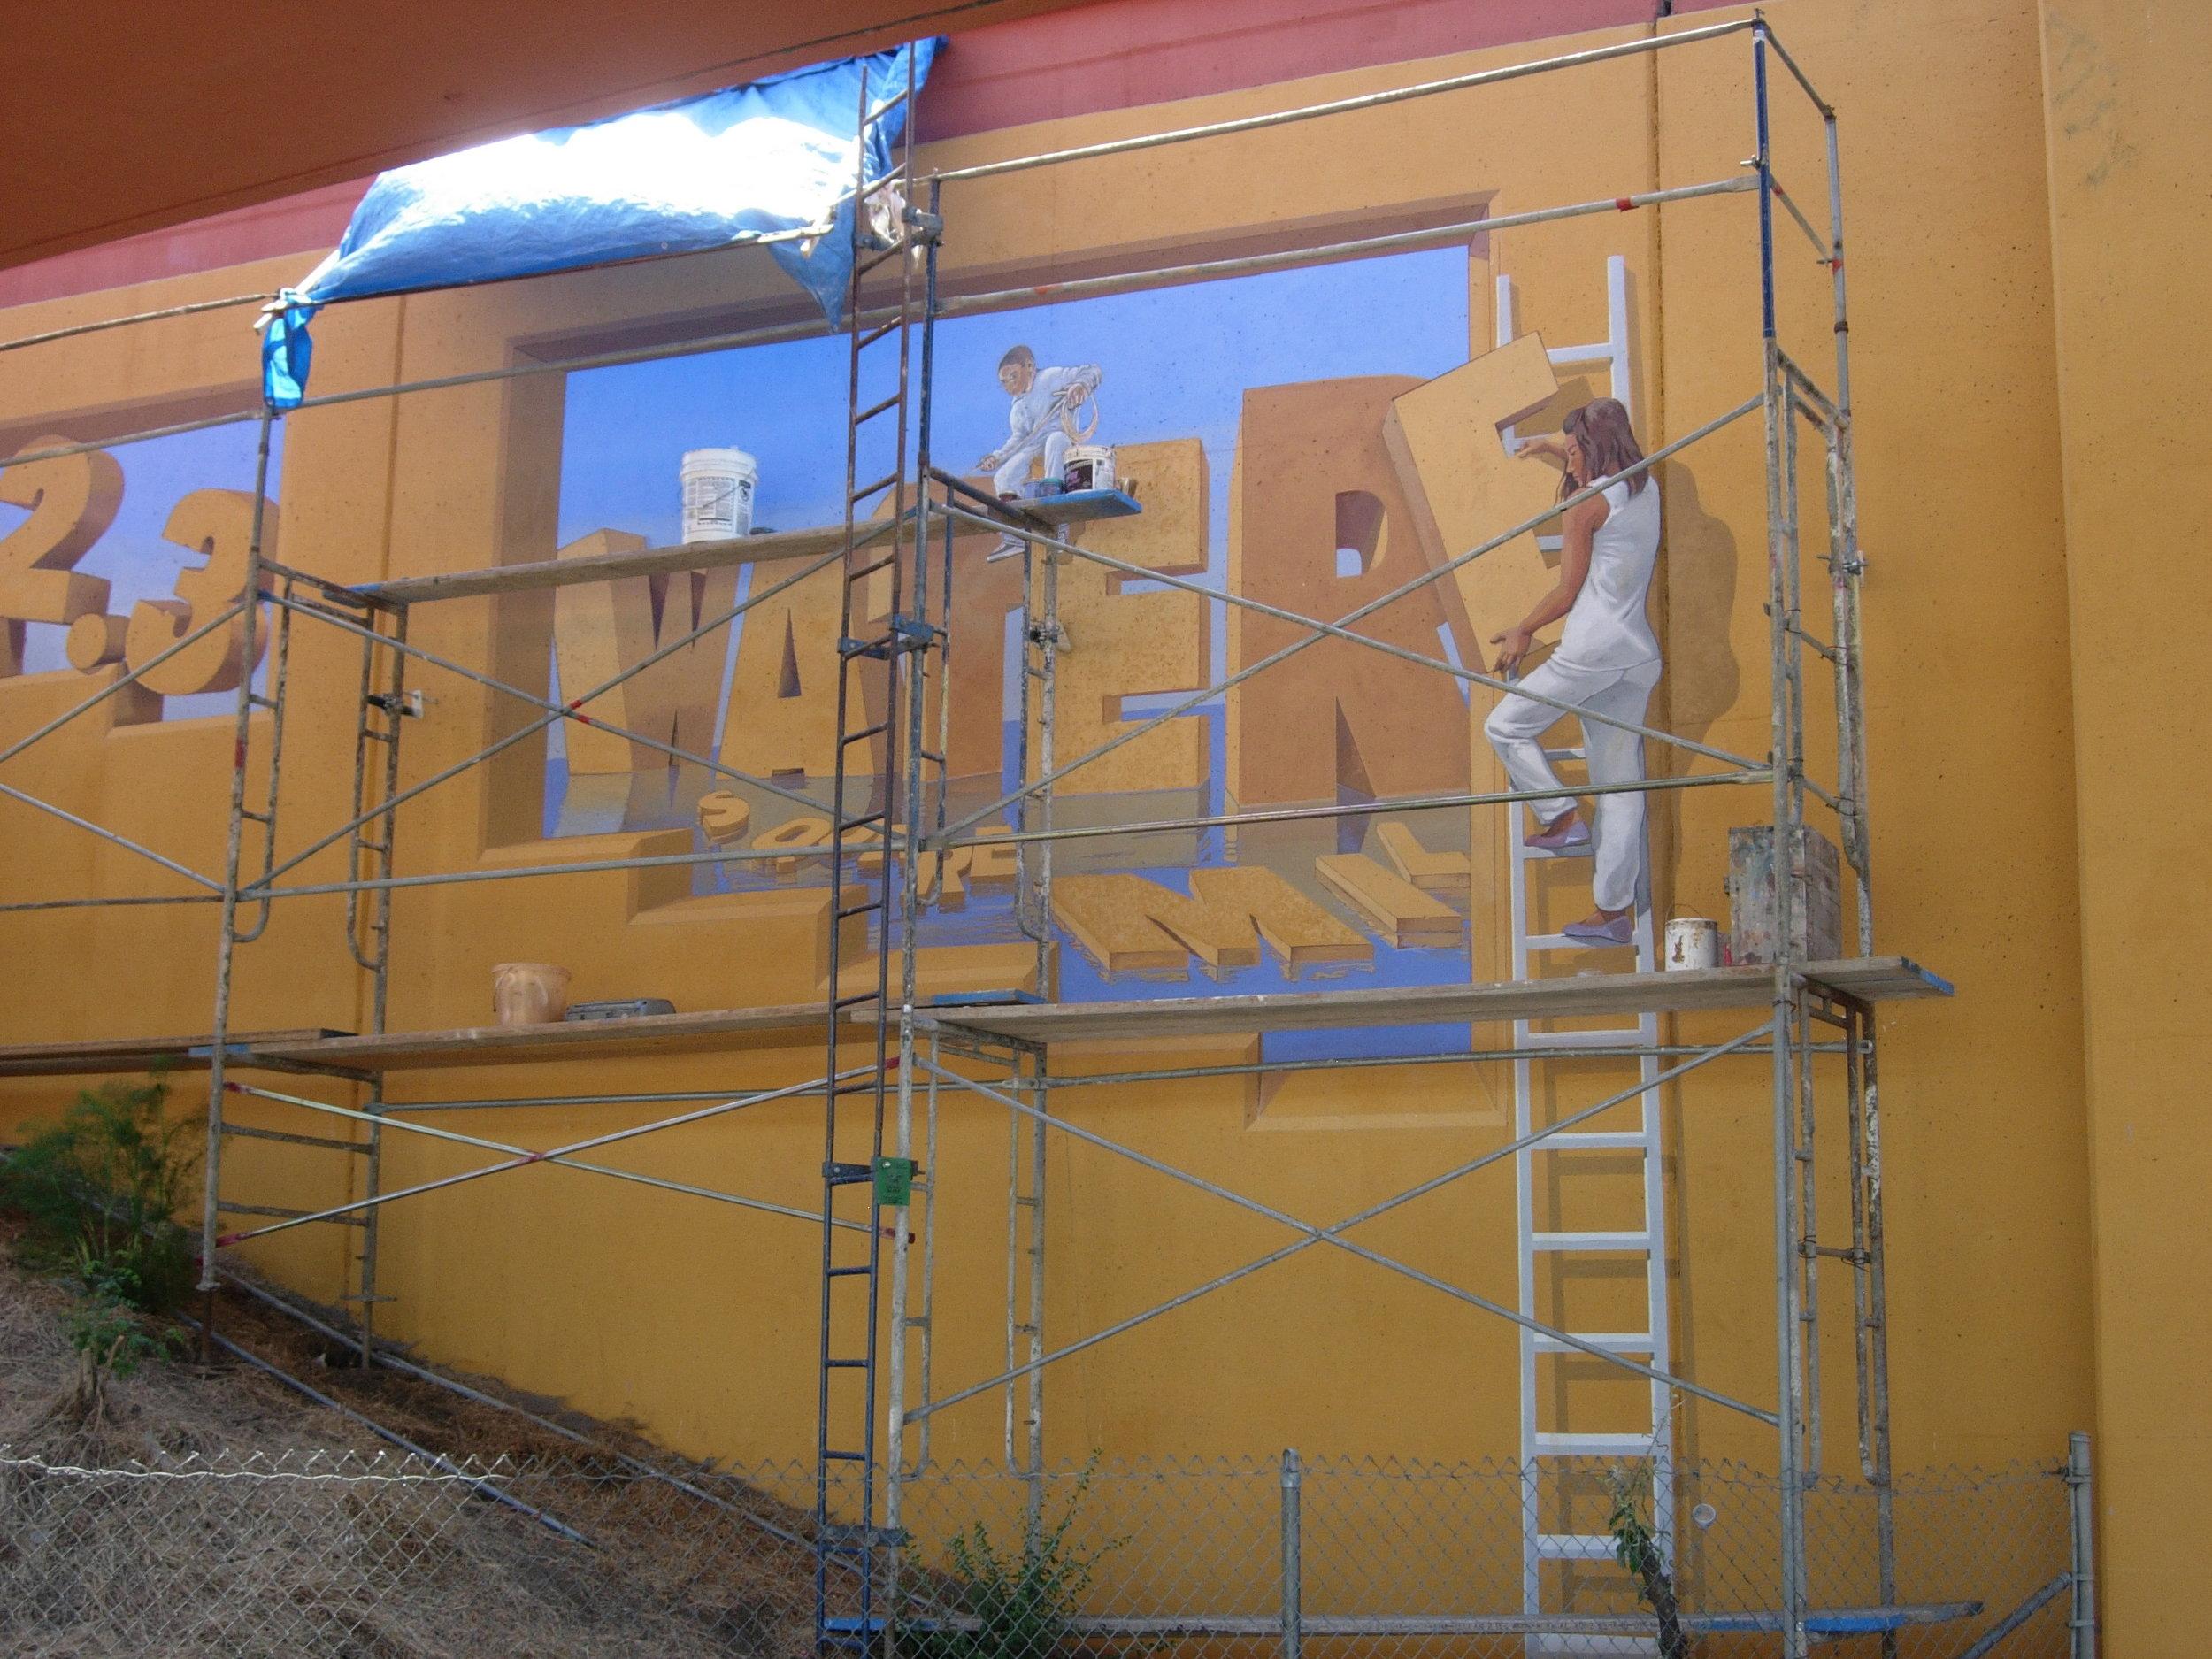 Project: McDonald Avenue 2007    Media: Keim silicates    Dimensions: Varies over many larger walls    Location: McDonald Avenue, 80 Underpass,